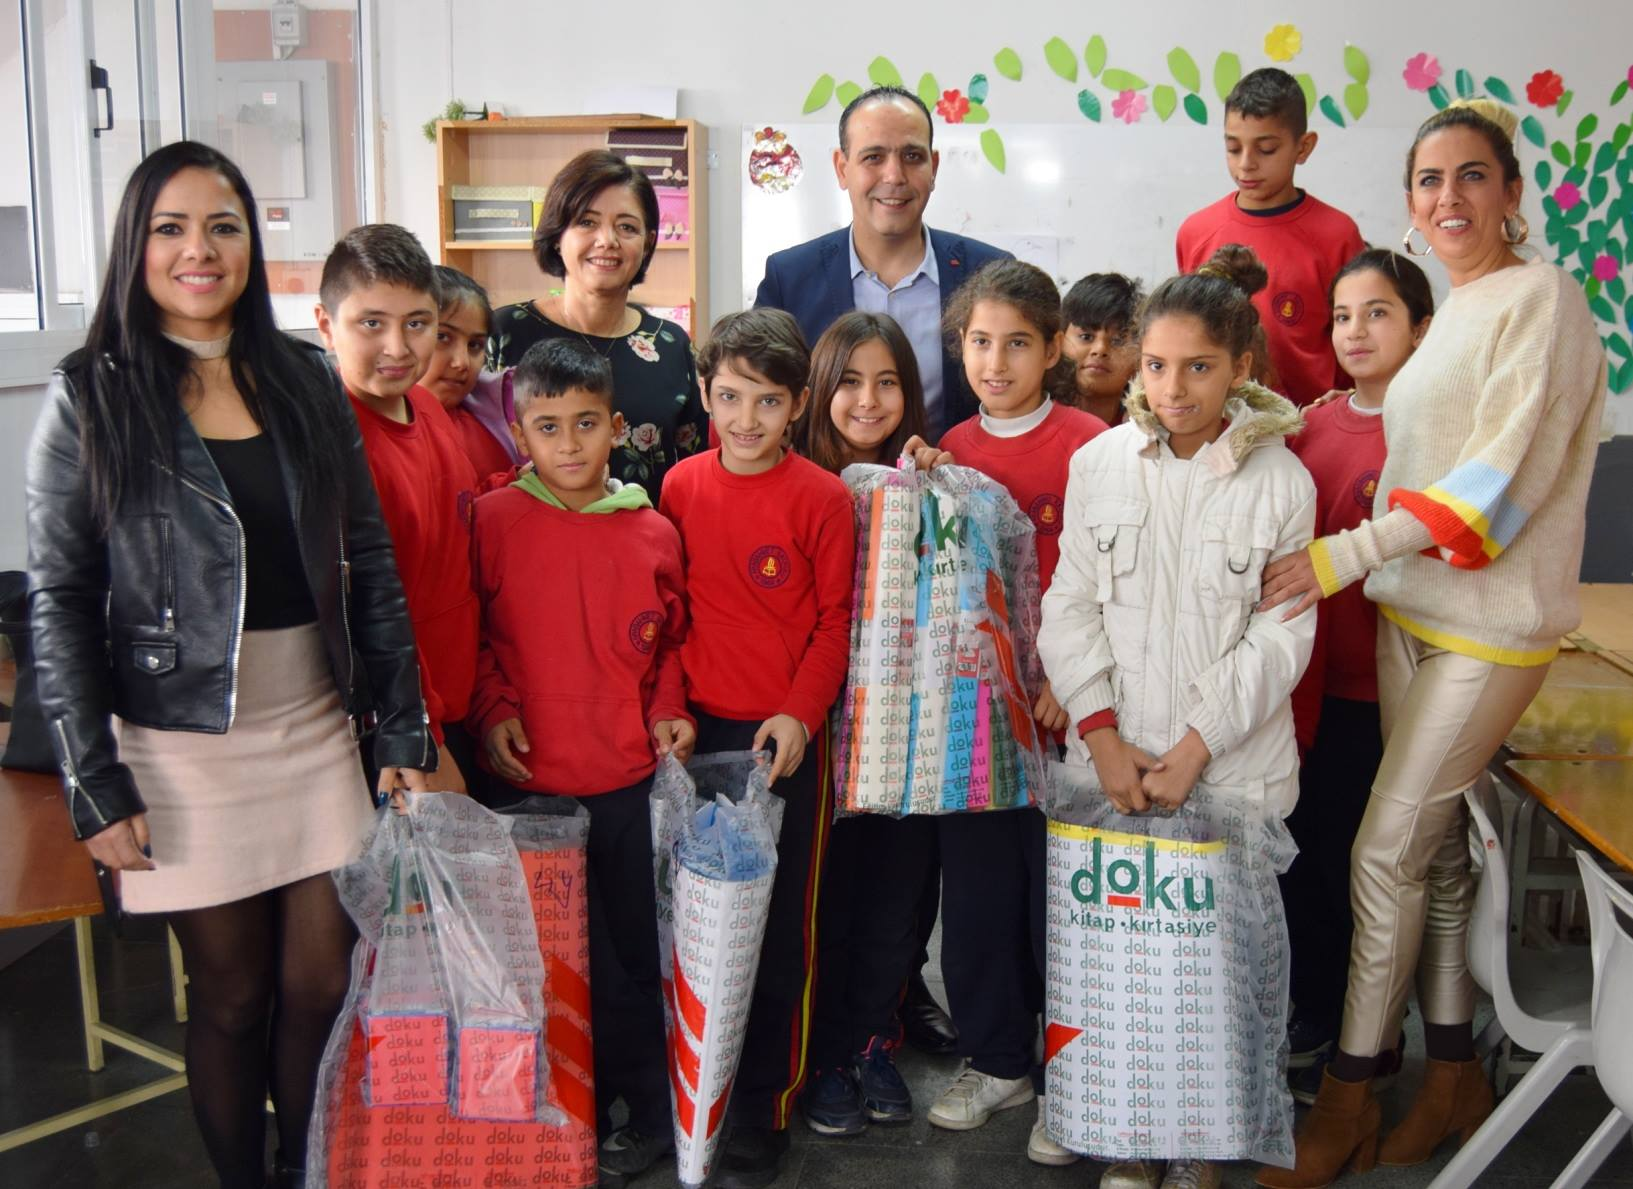 Мэр Лефкоши привез канцелярские товары в школу Арабахмета